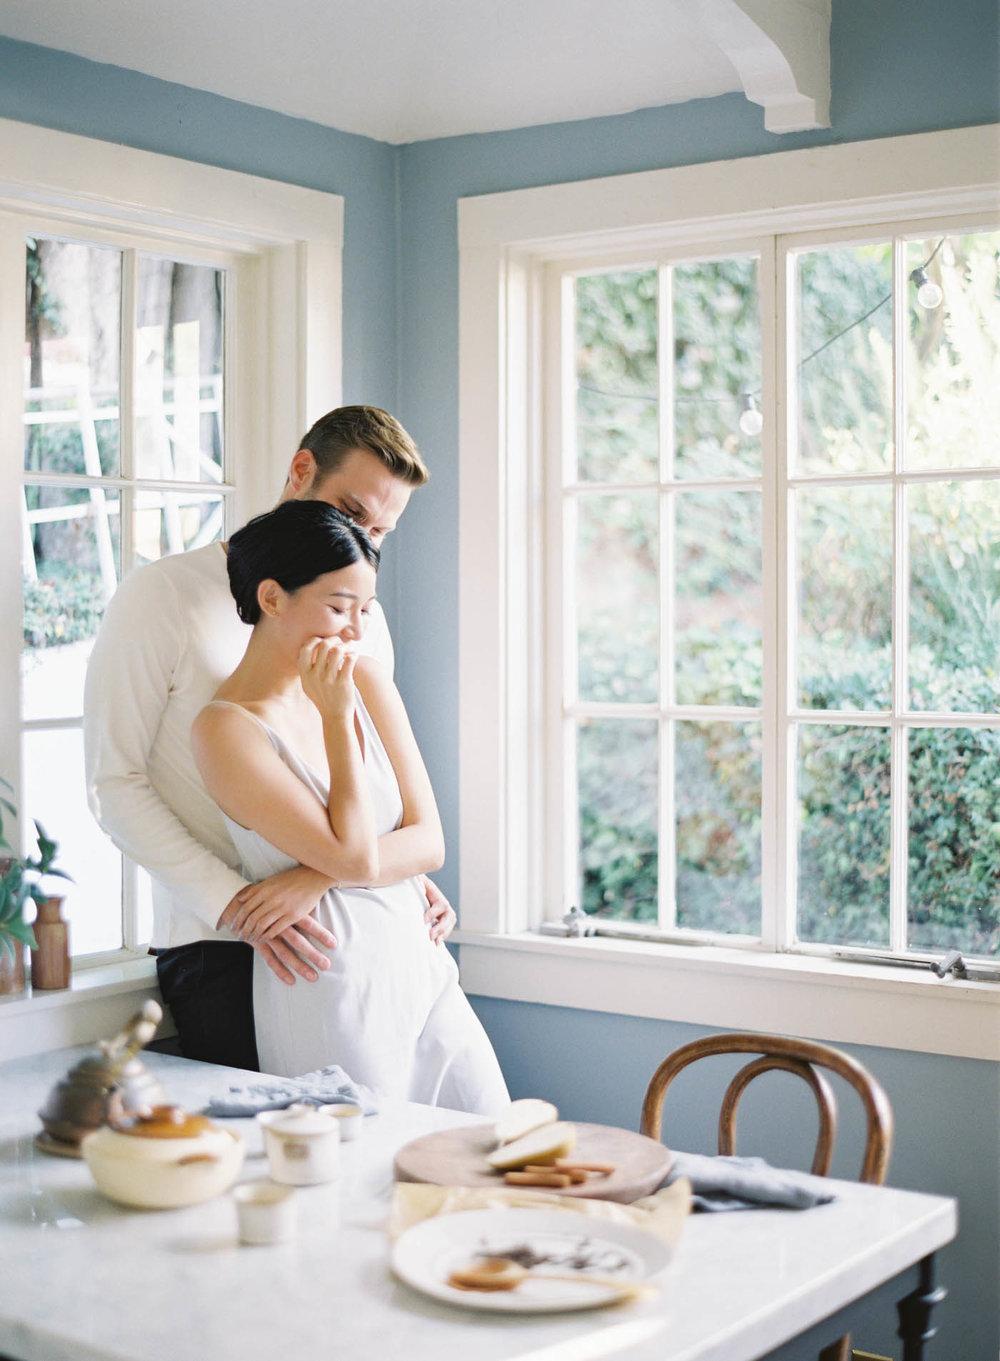 riviera-house-engagement-119-Jen_Huang-Tea-Ceremony-369-Jen_Huang-004147-R1-012.jpg